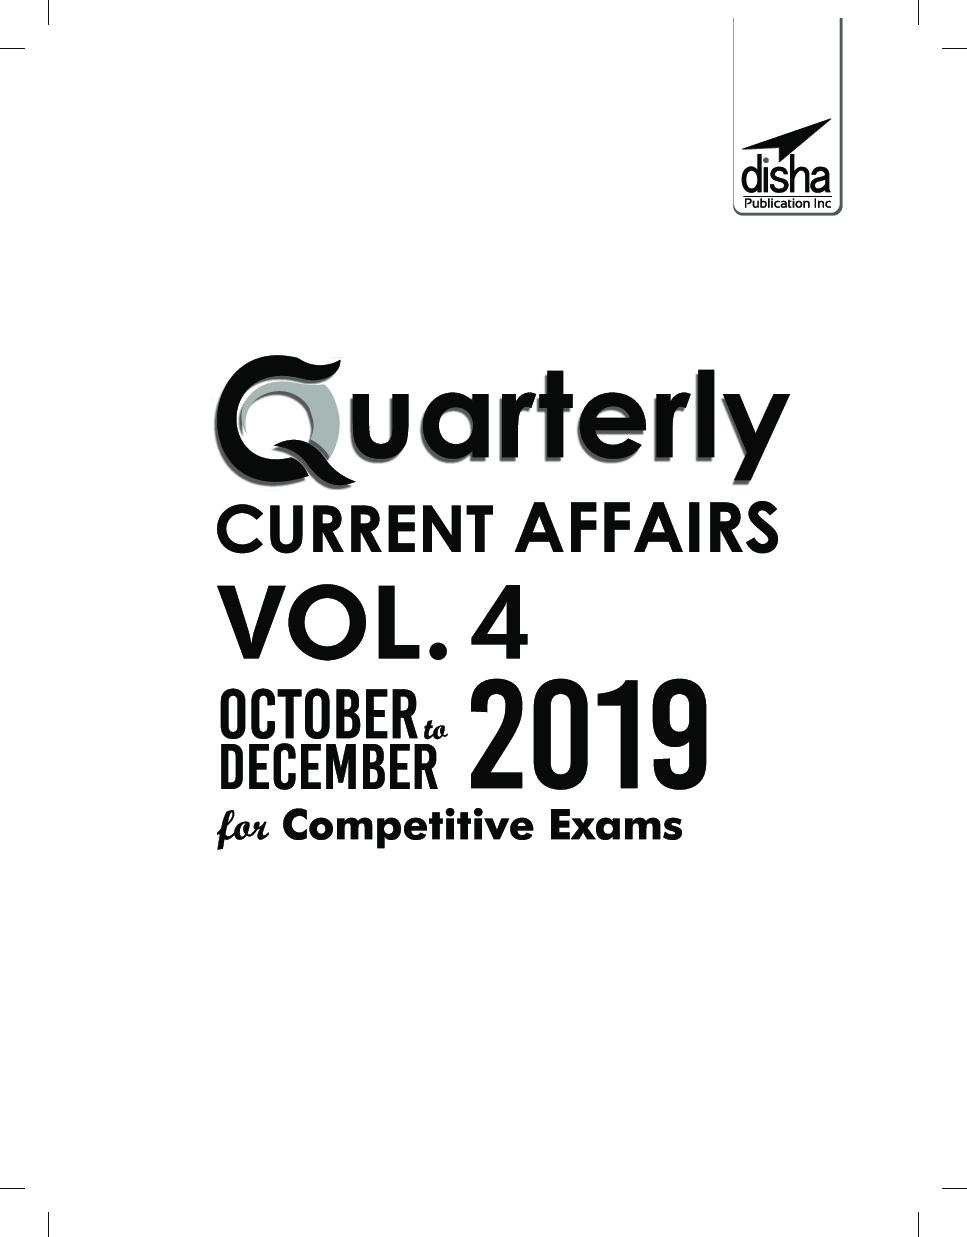 Disha Yearly Current Affairs Magazine 2019 PDF Free …